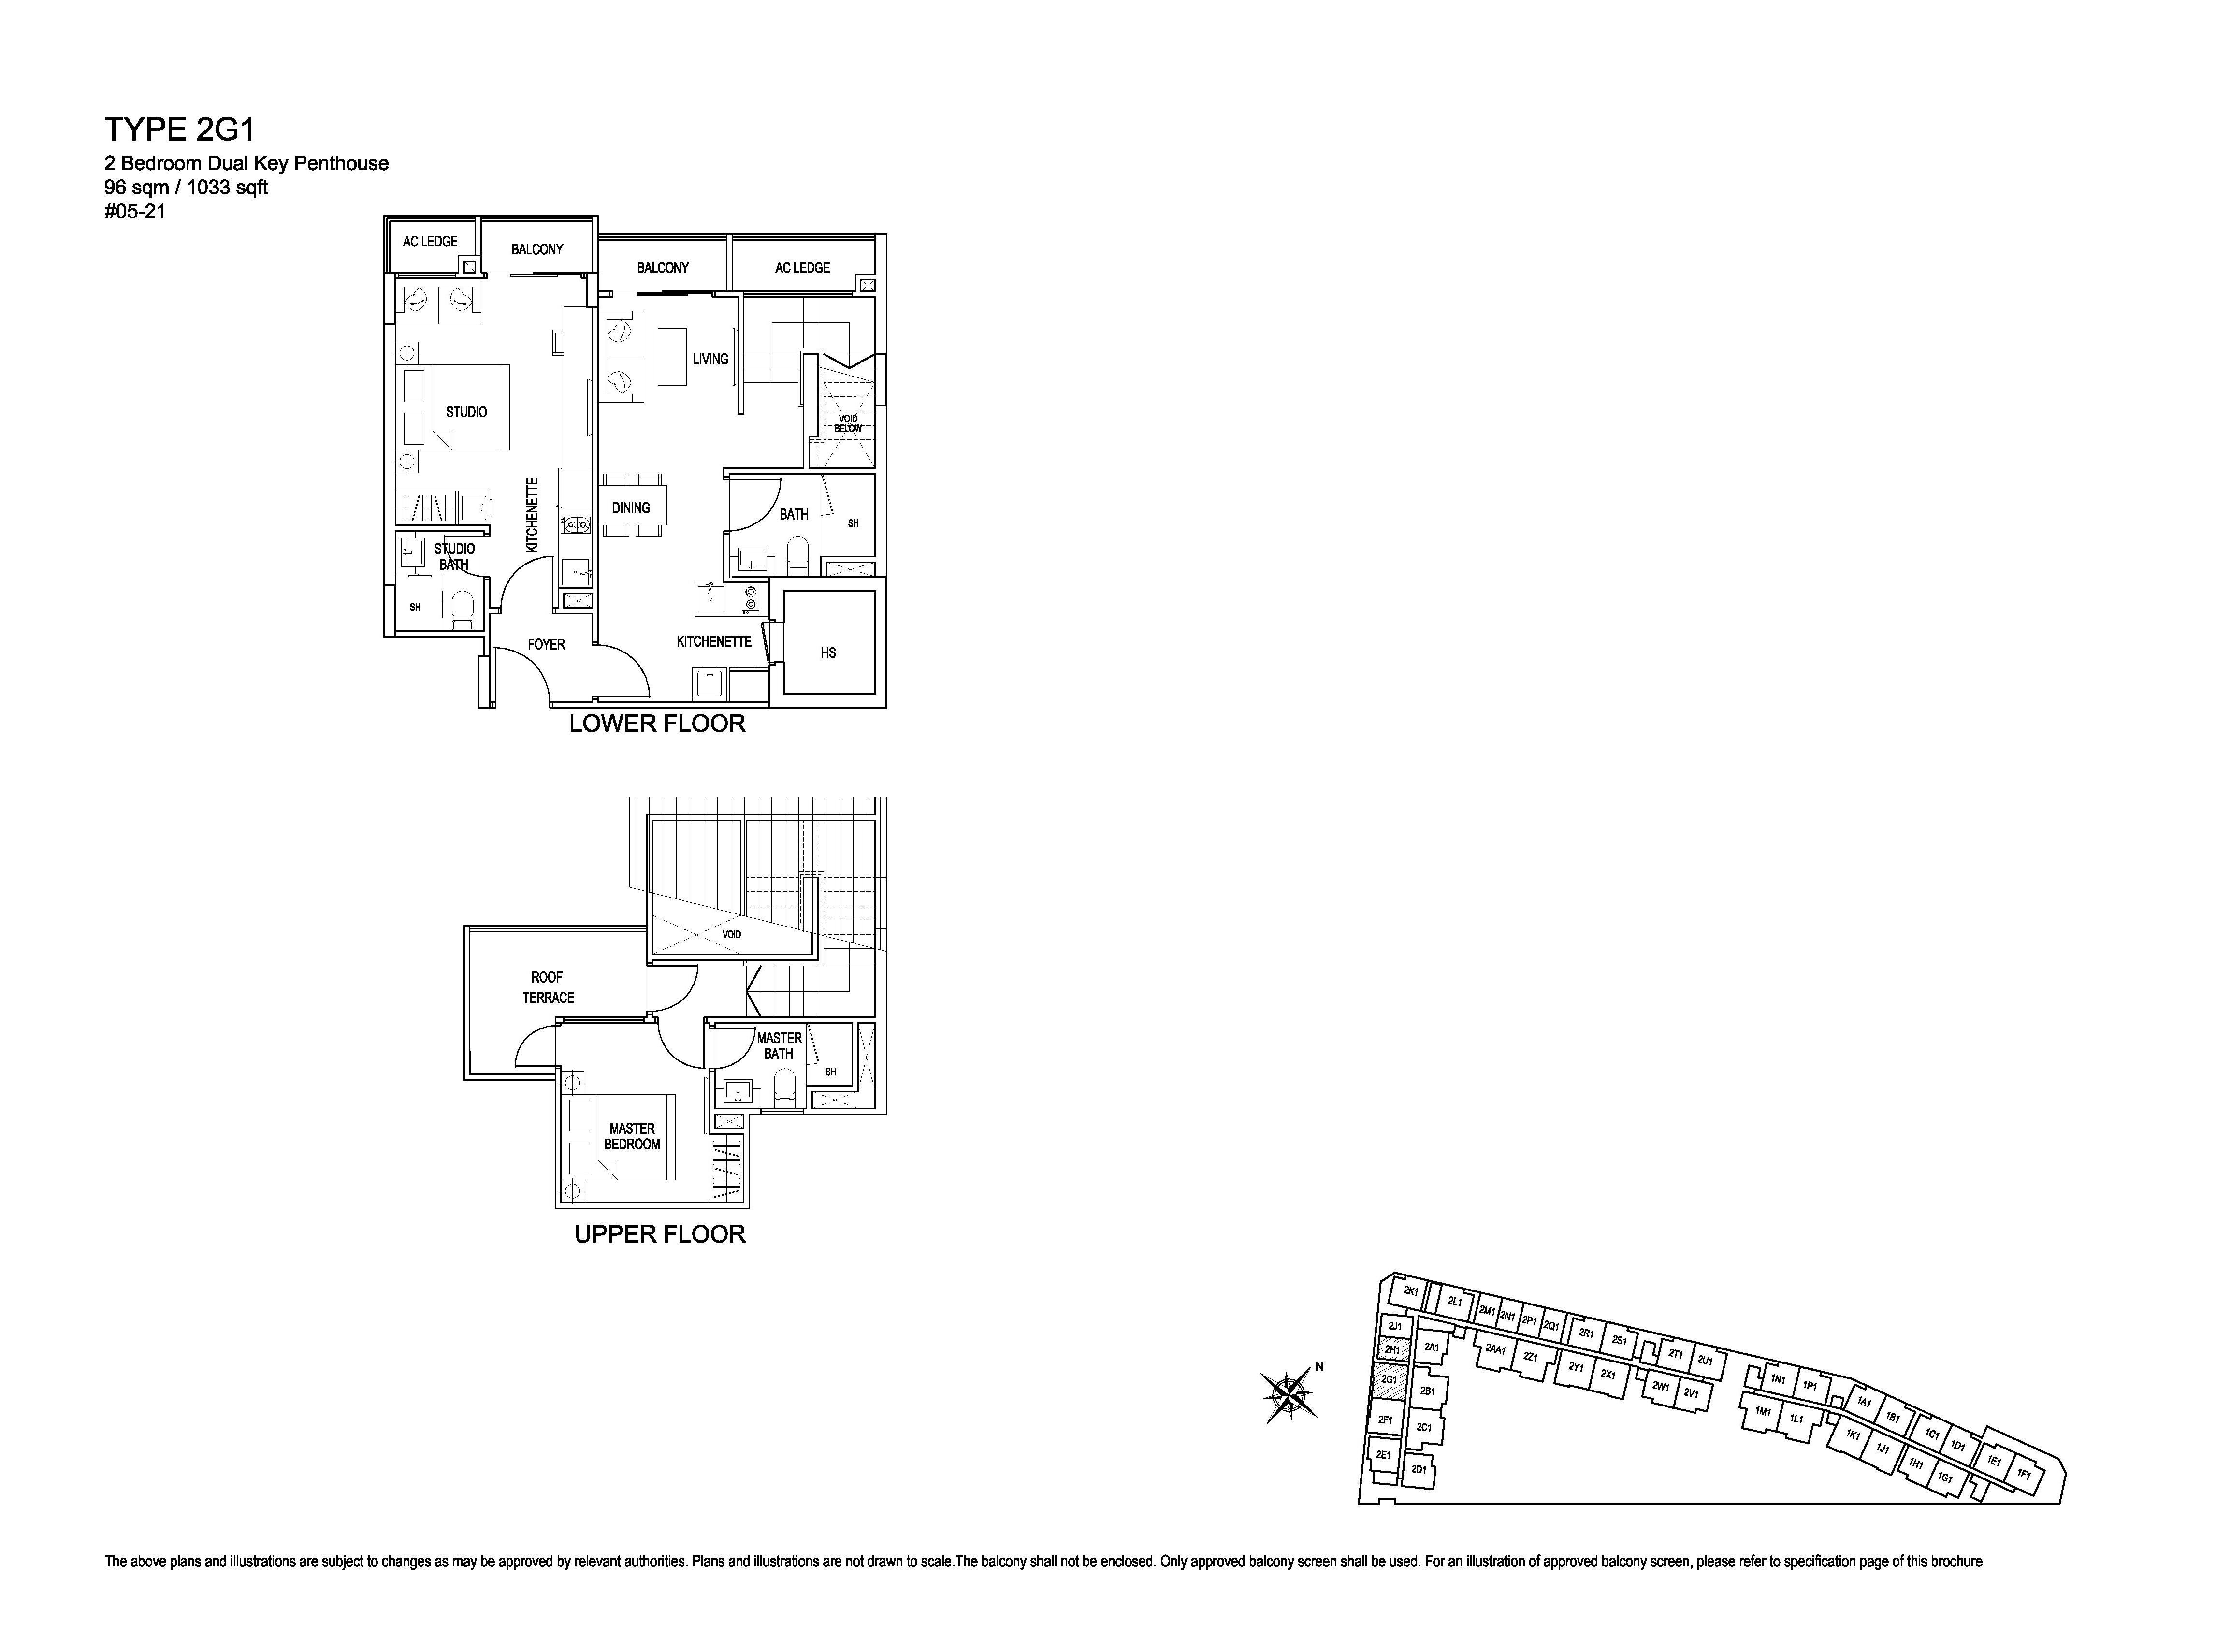 Kensington Square 2 Bedroom Dual Key Penthouse Floor Plans Type 2G1